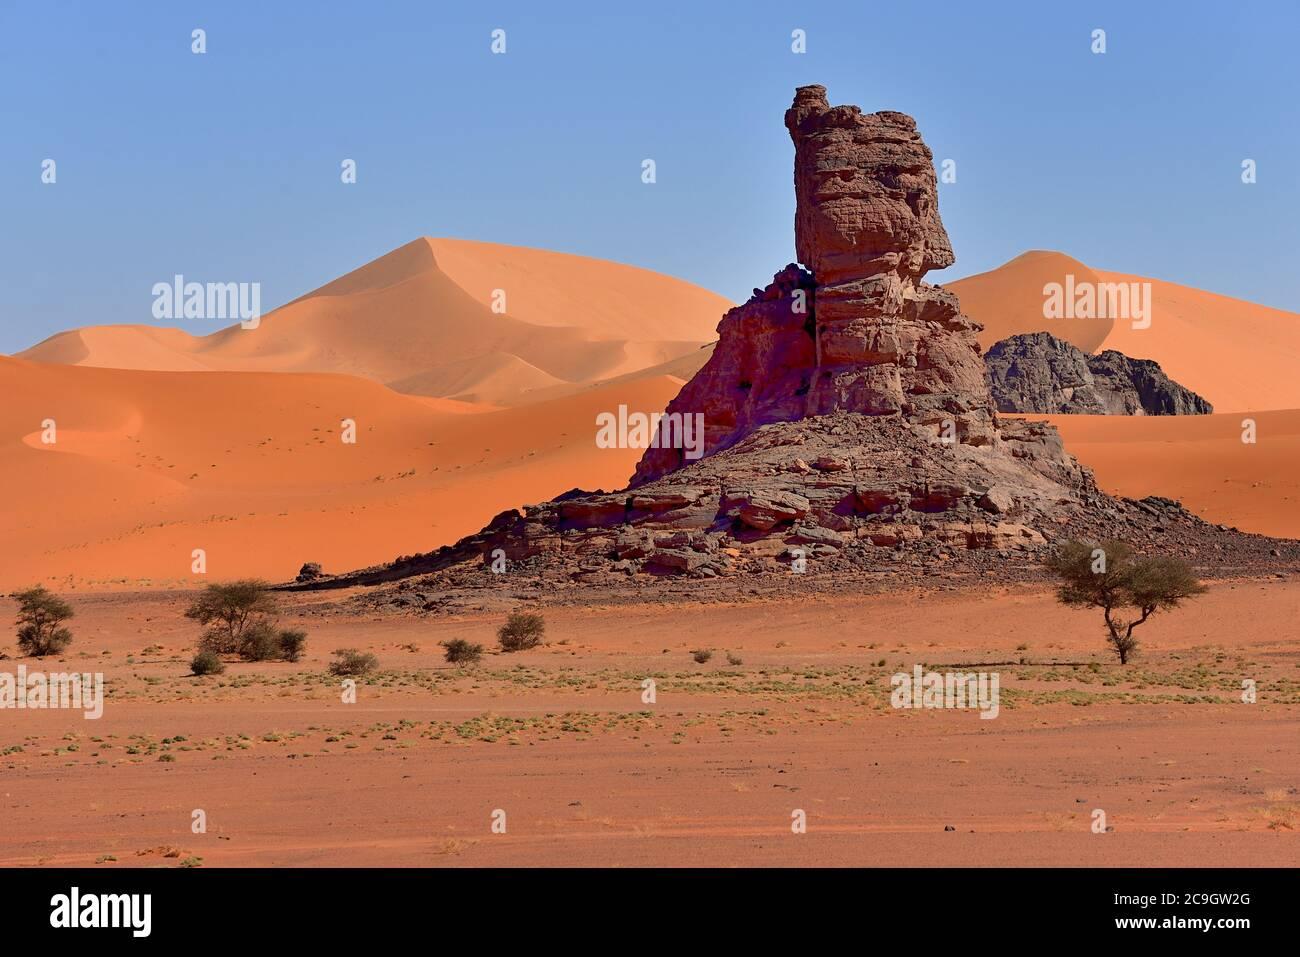 TADRART ROUGE , ALGERIA. DESERTO DEL SAHARA. TIN MERZOUGA E MOUL N AGA DUNE DESERTICHE E MODELLI DI SABBIA. Foto Stock